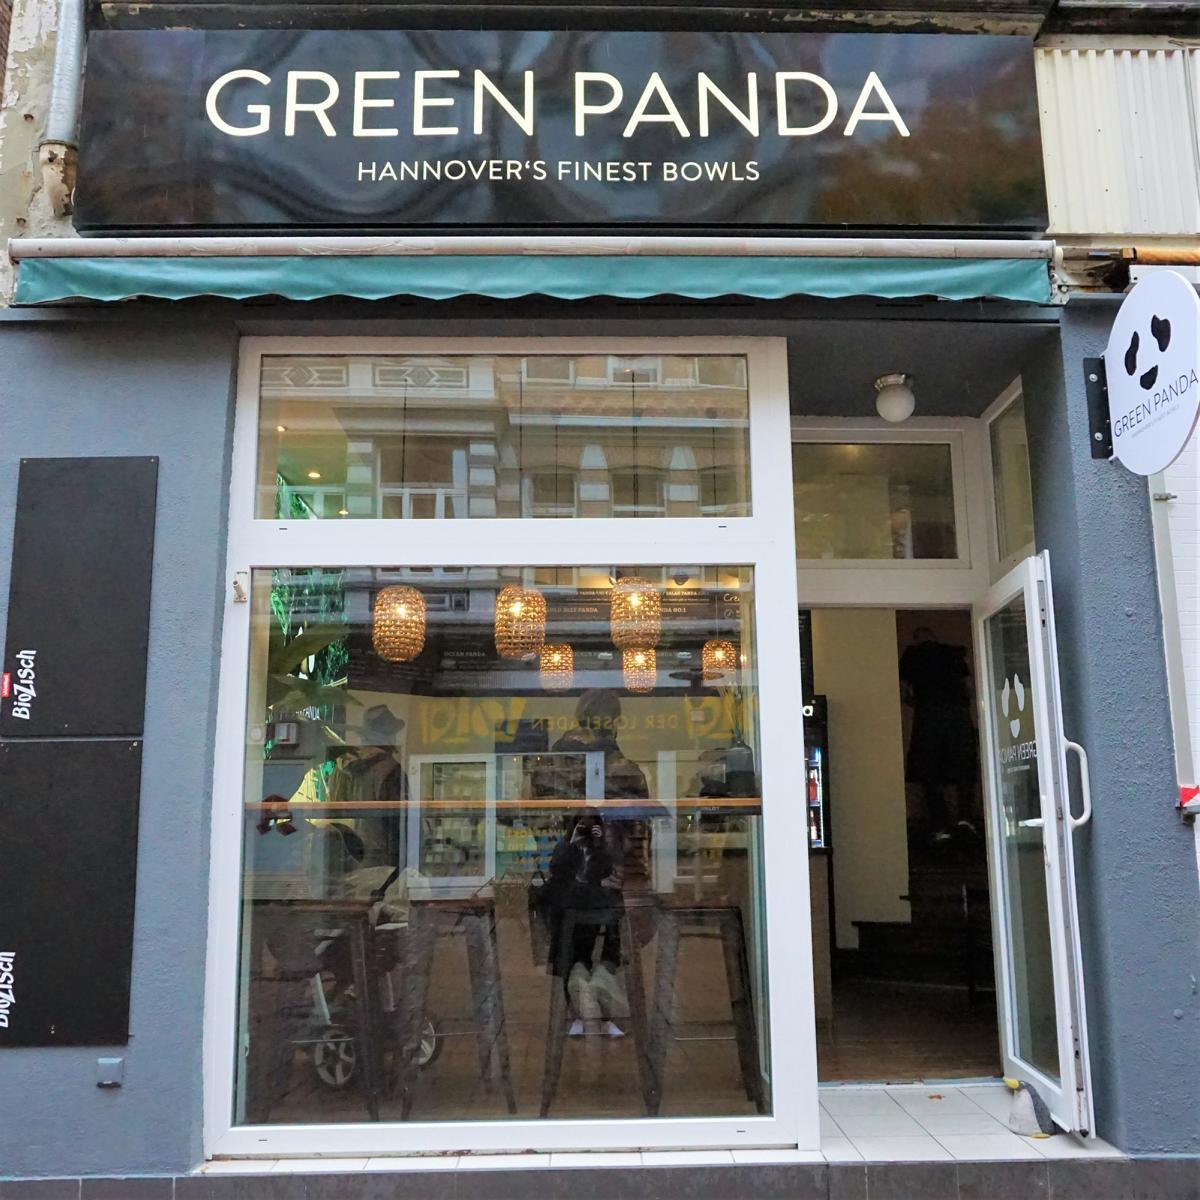 Style Hannover Green Panda 1 - Green Panda – asiatische Bowls